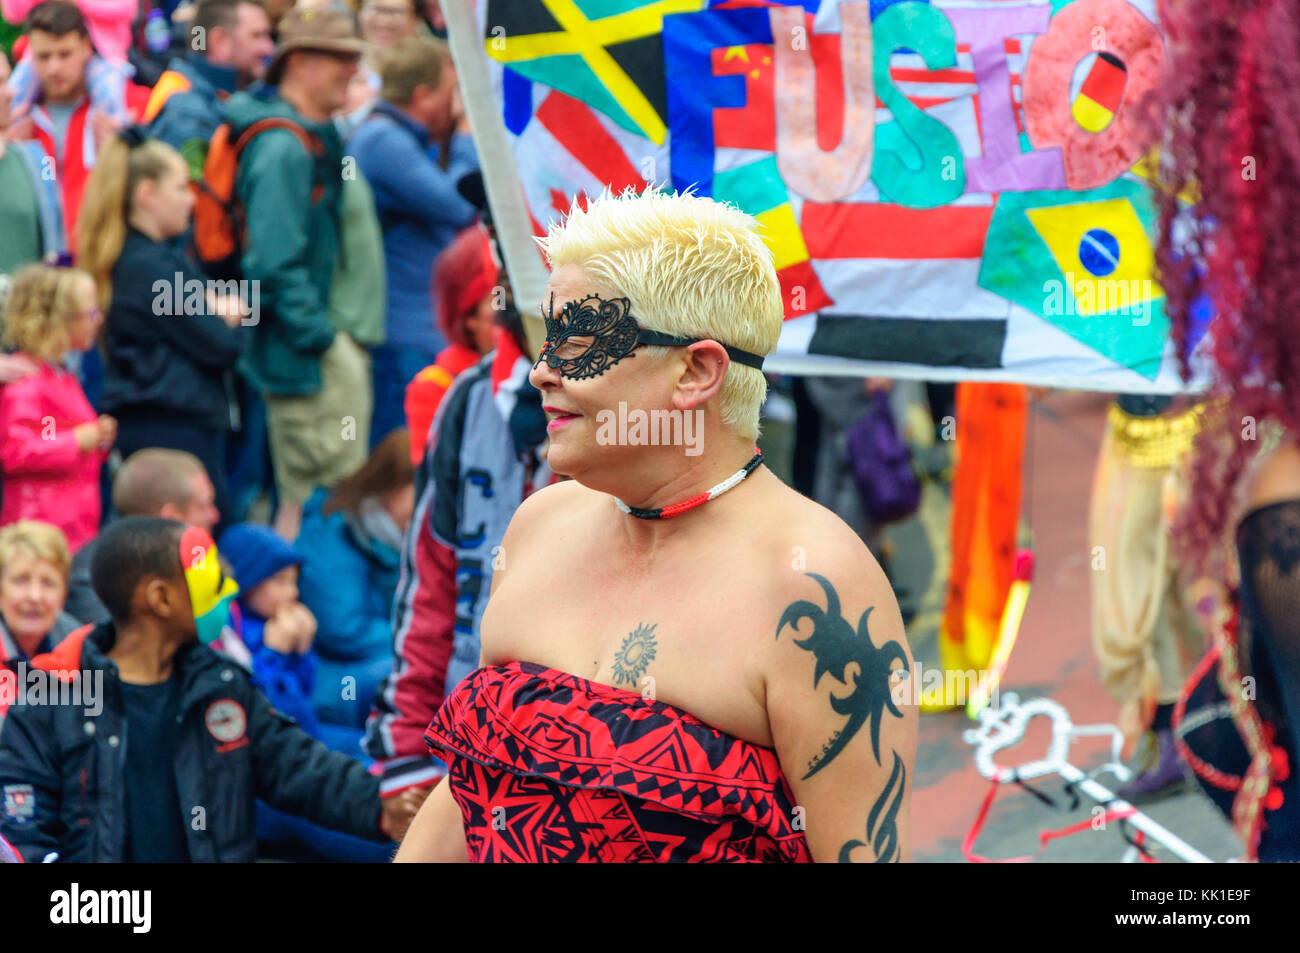 Jazz tattoo edinburgh opening times